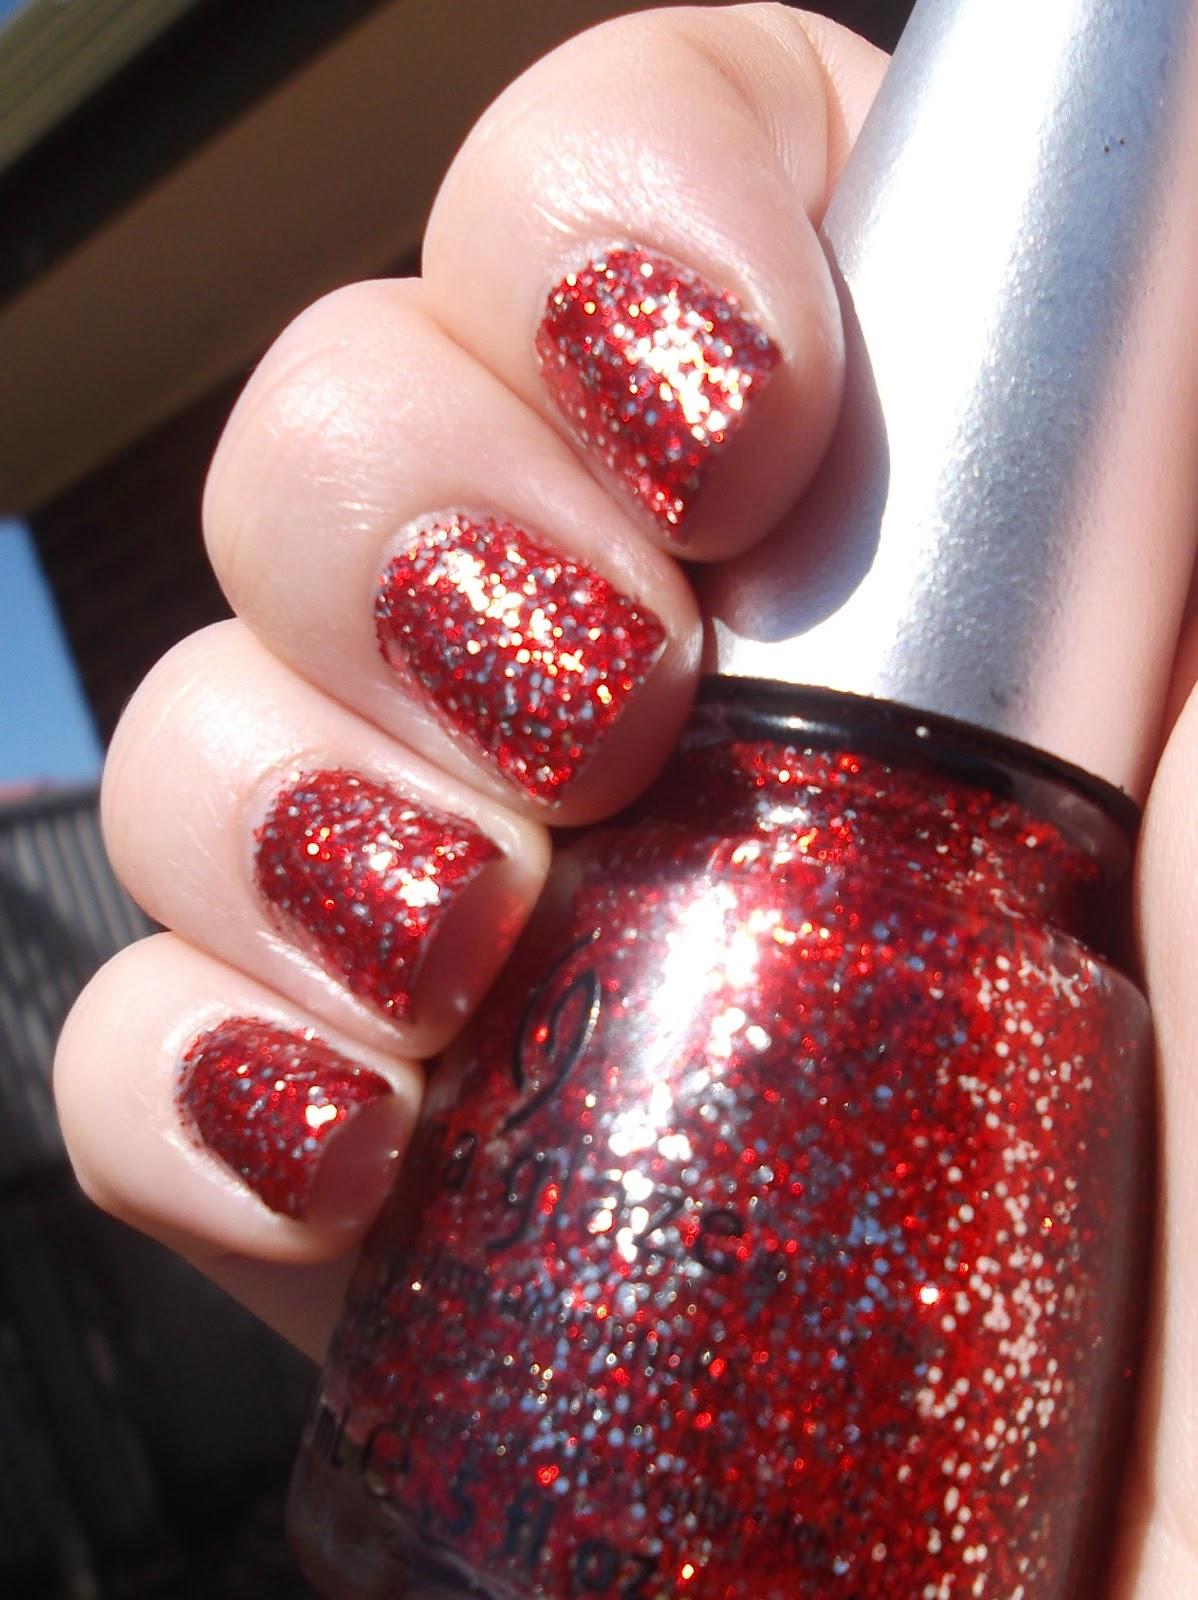 China Glaze Presenta Crakle Glaze: Obsessed With All Things Shiny: China Glaze Love Marilyn